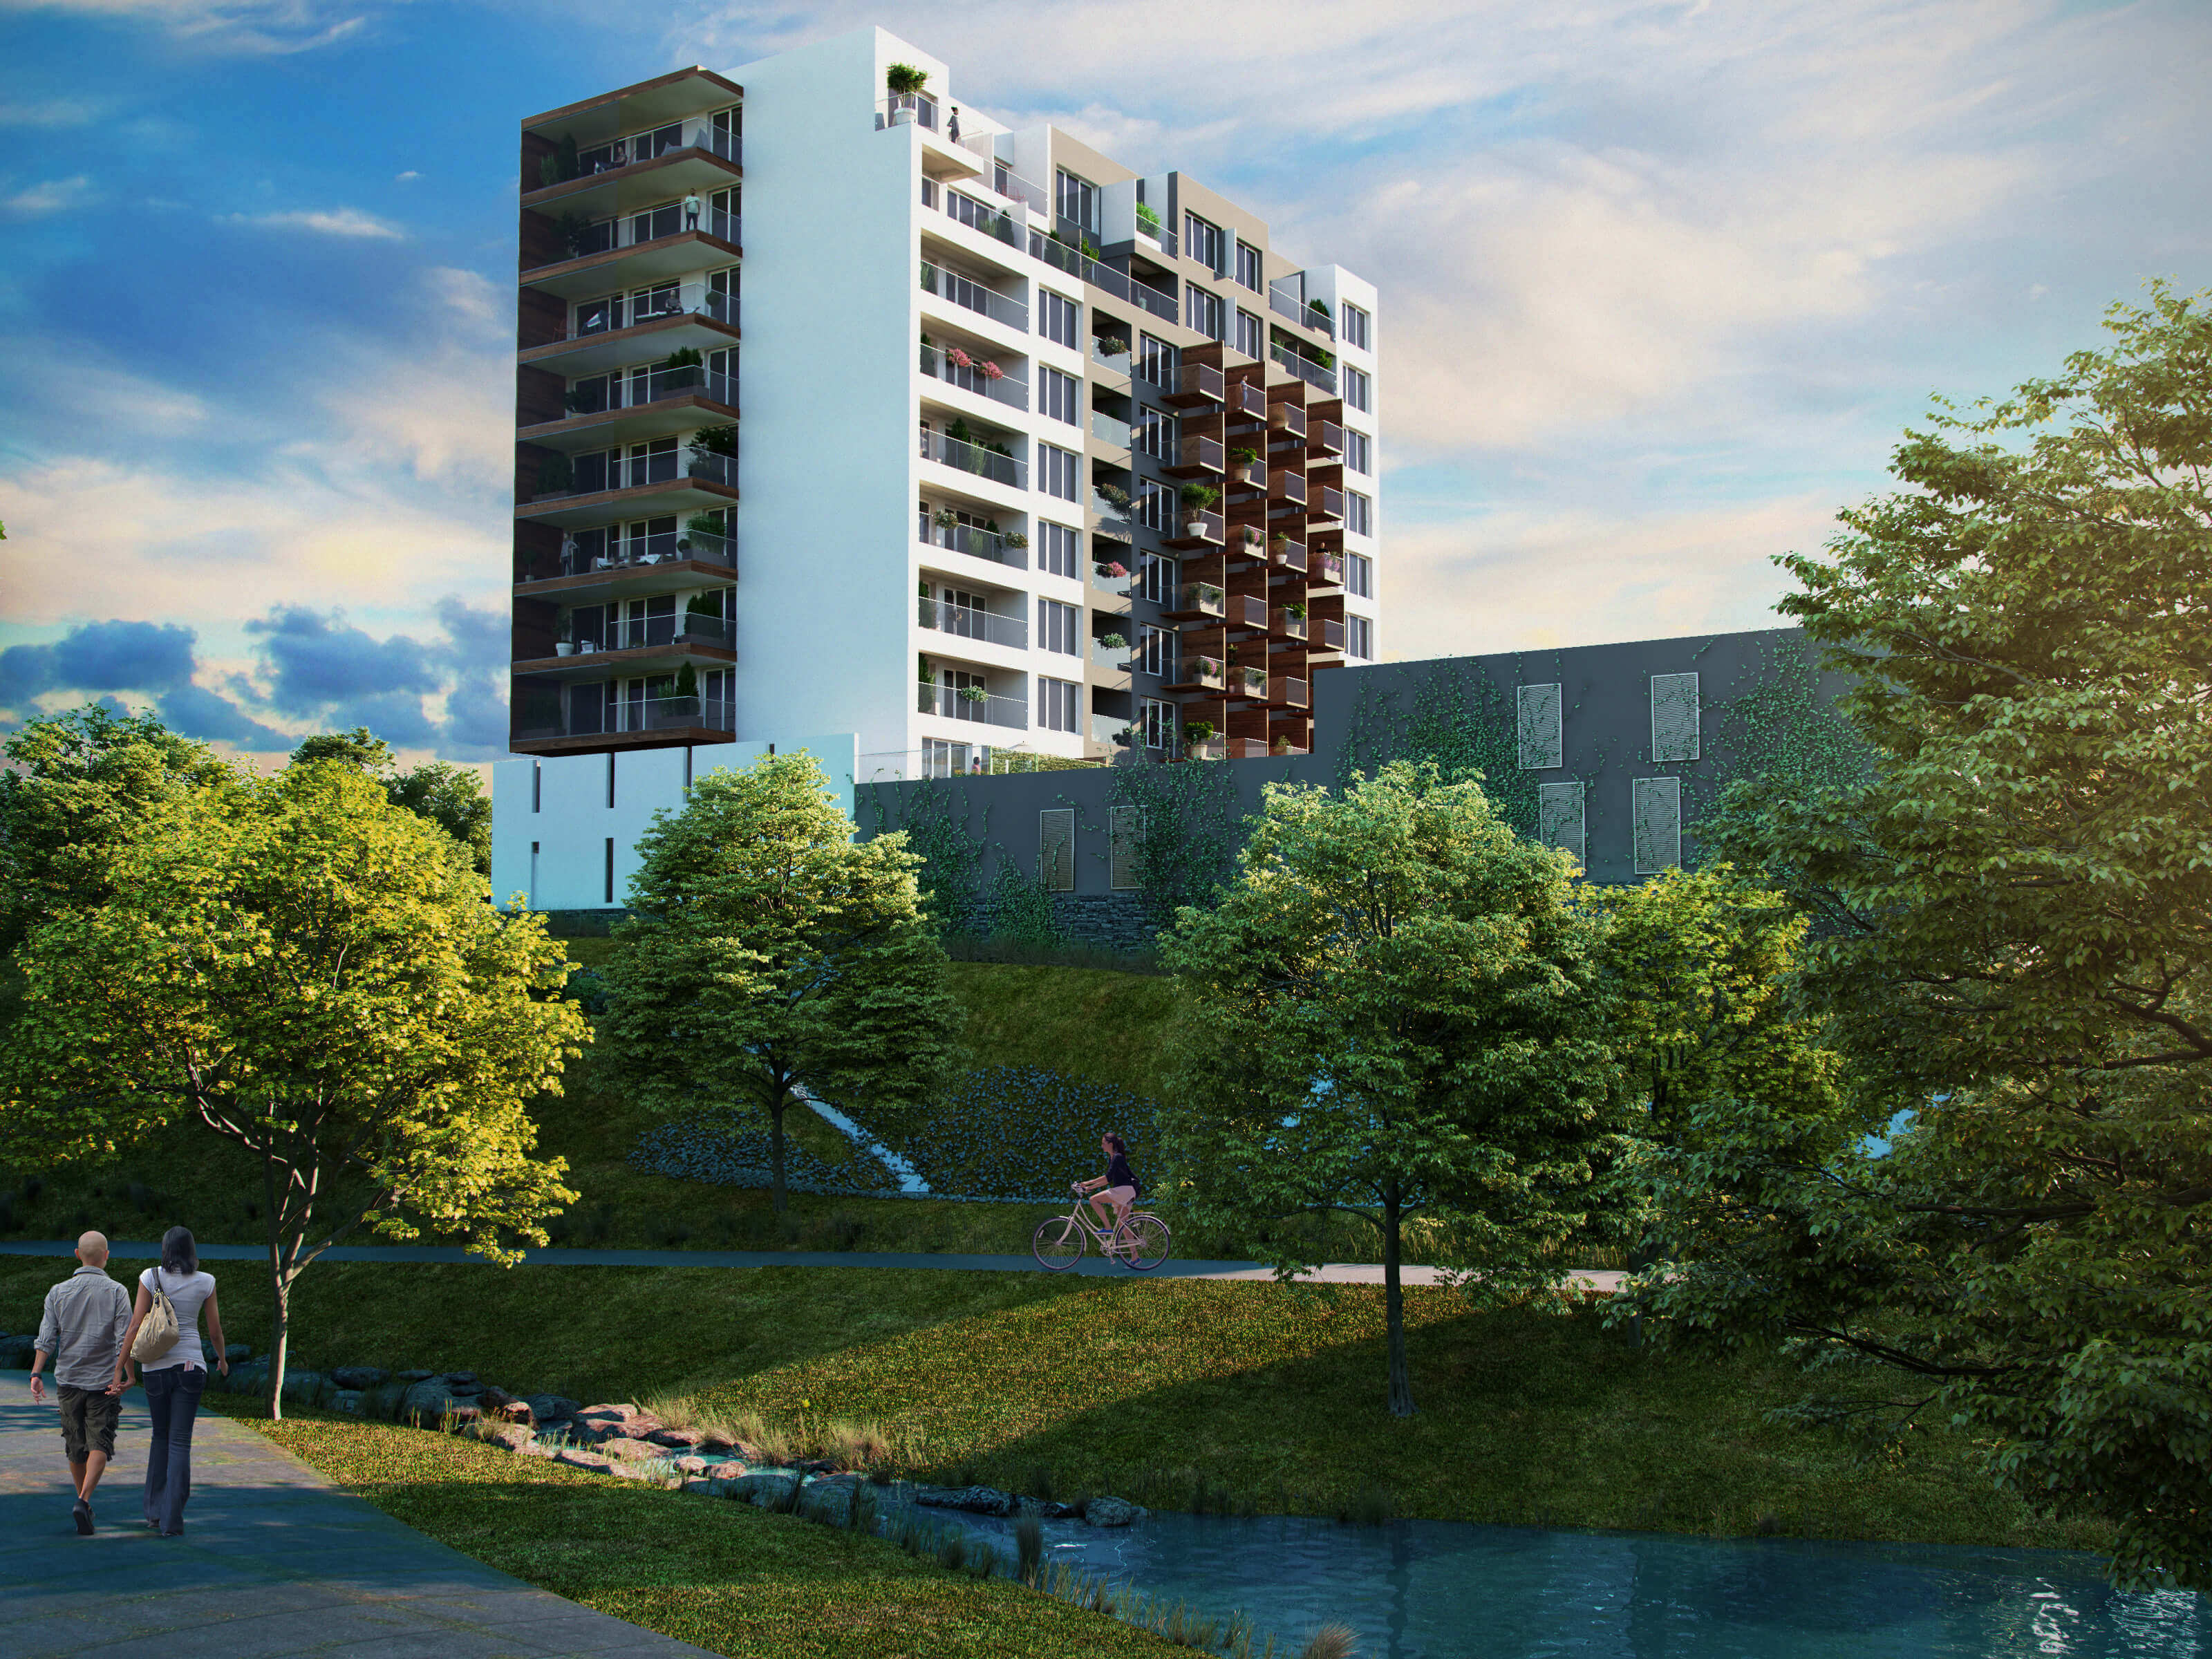 apartment for sale prague 4, new buildings prague, apartments for sale, prague, czech republic